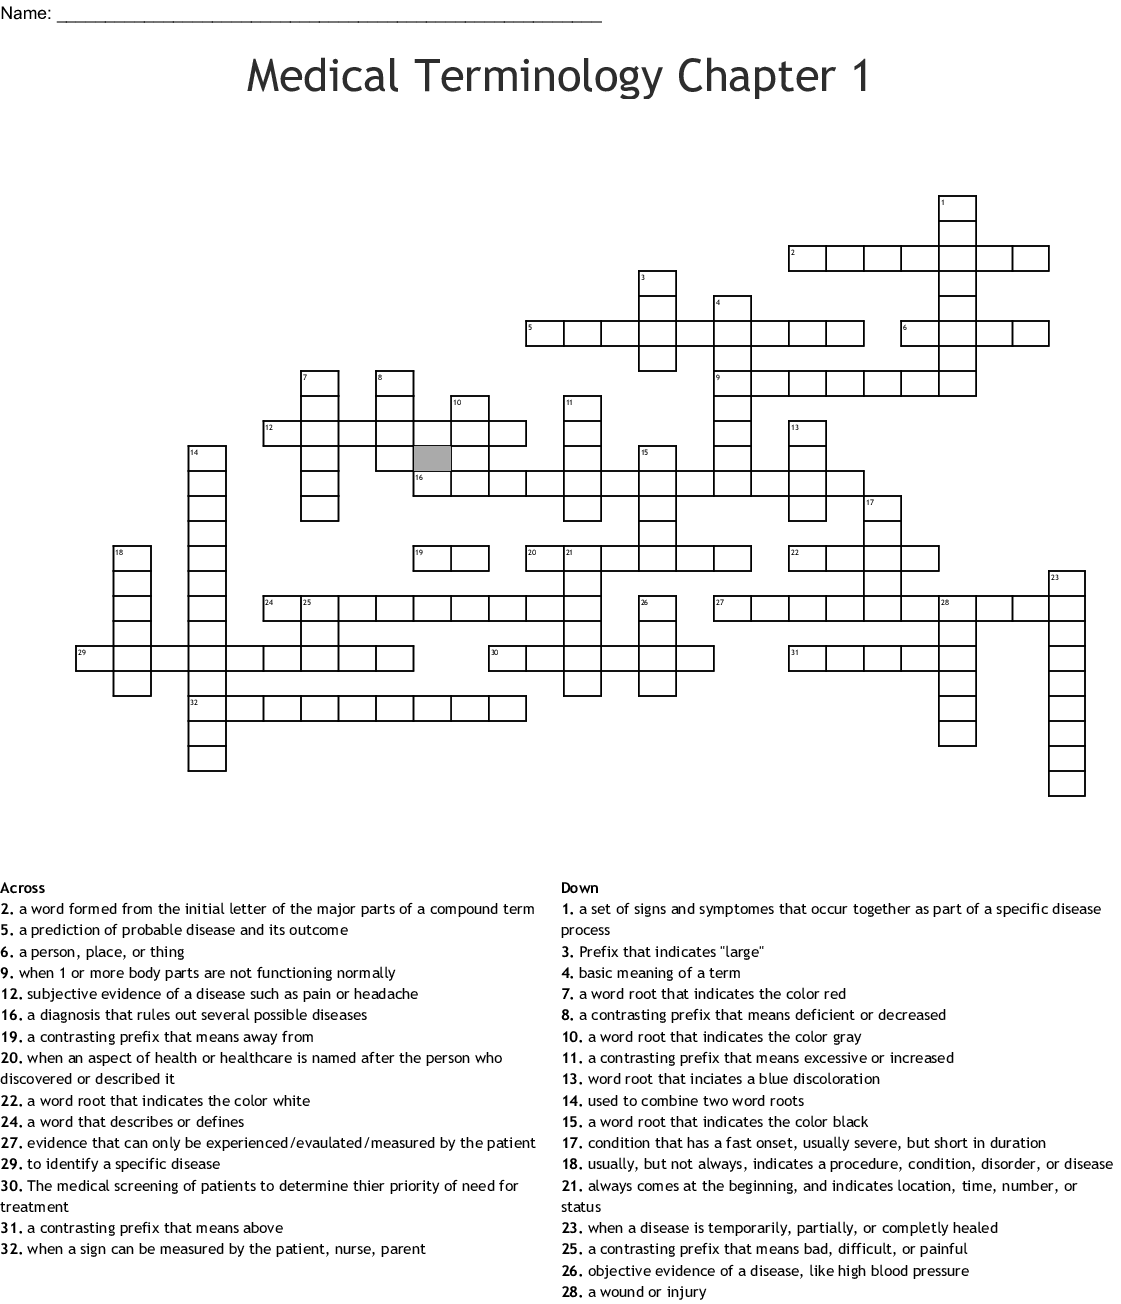 Medical Terminology 1 Combining Forms Crossword